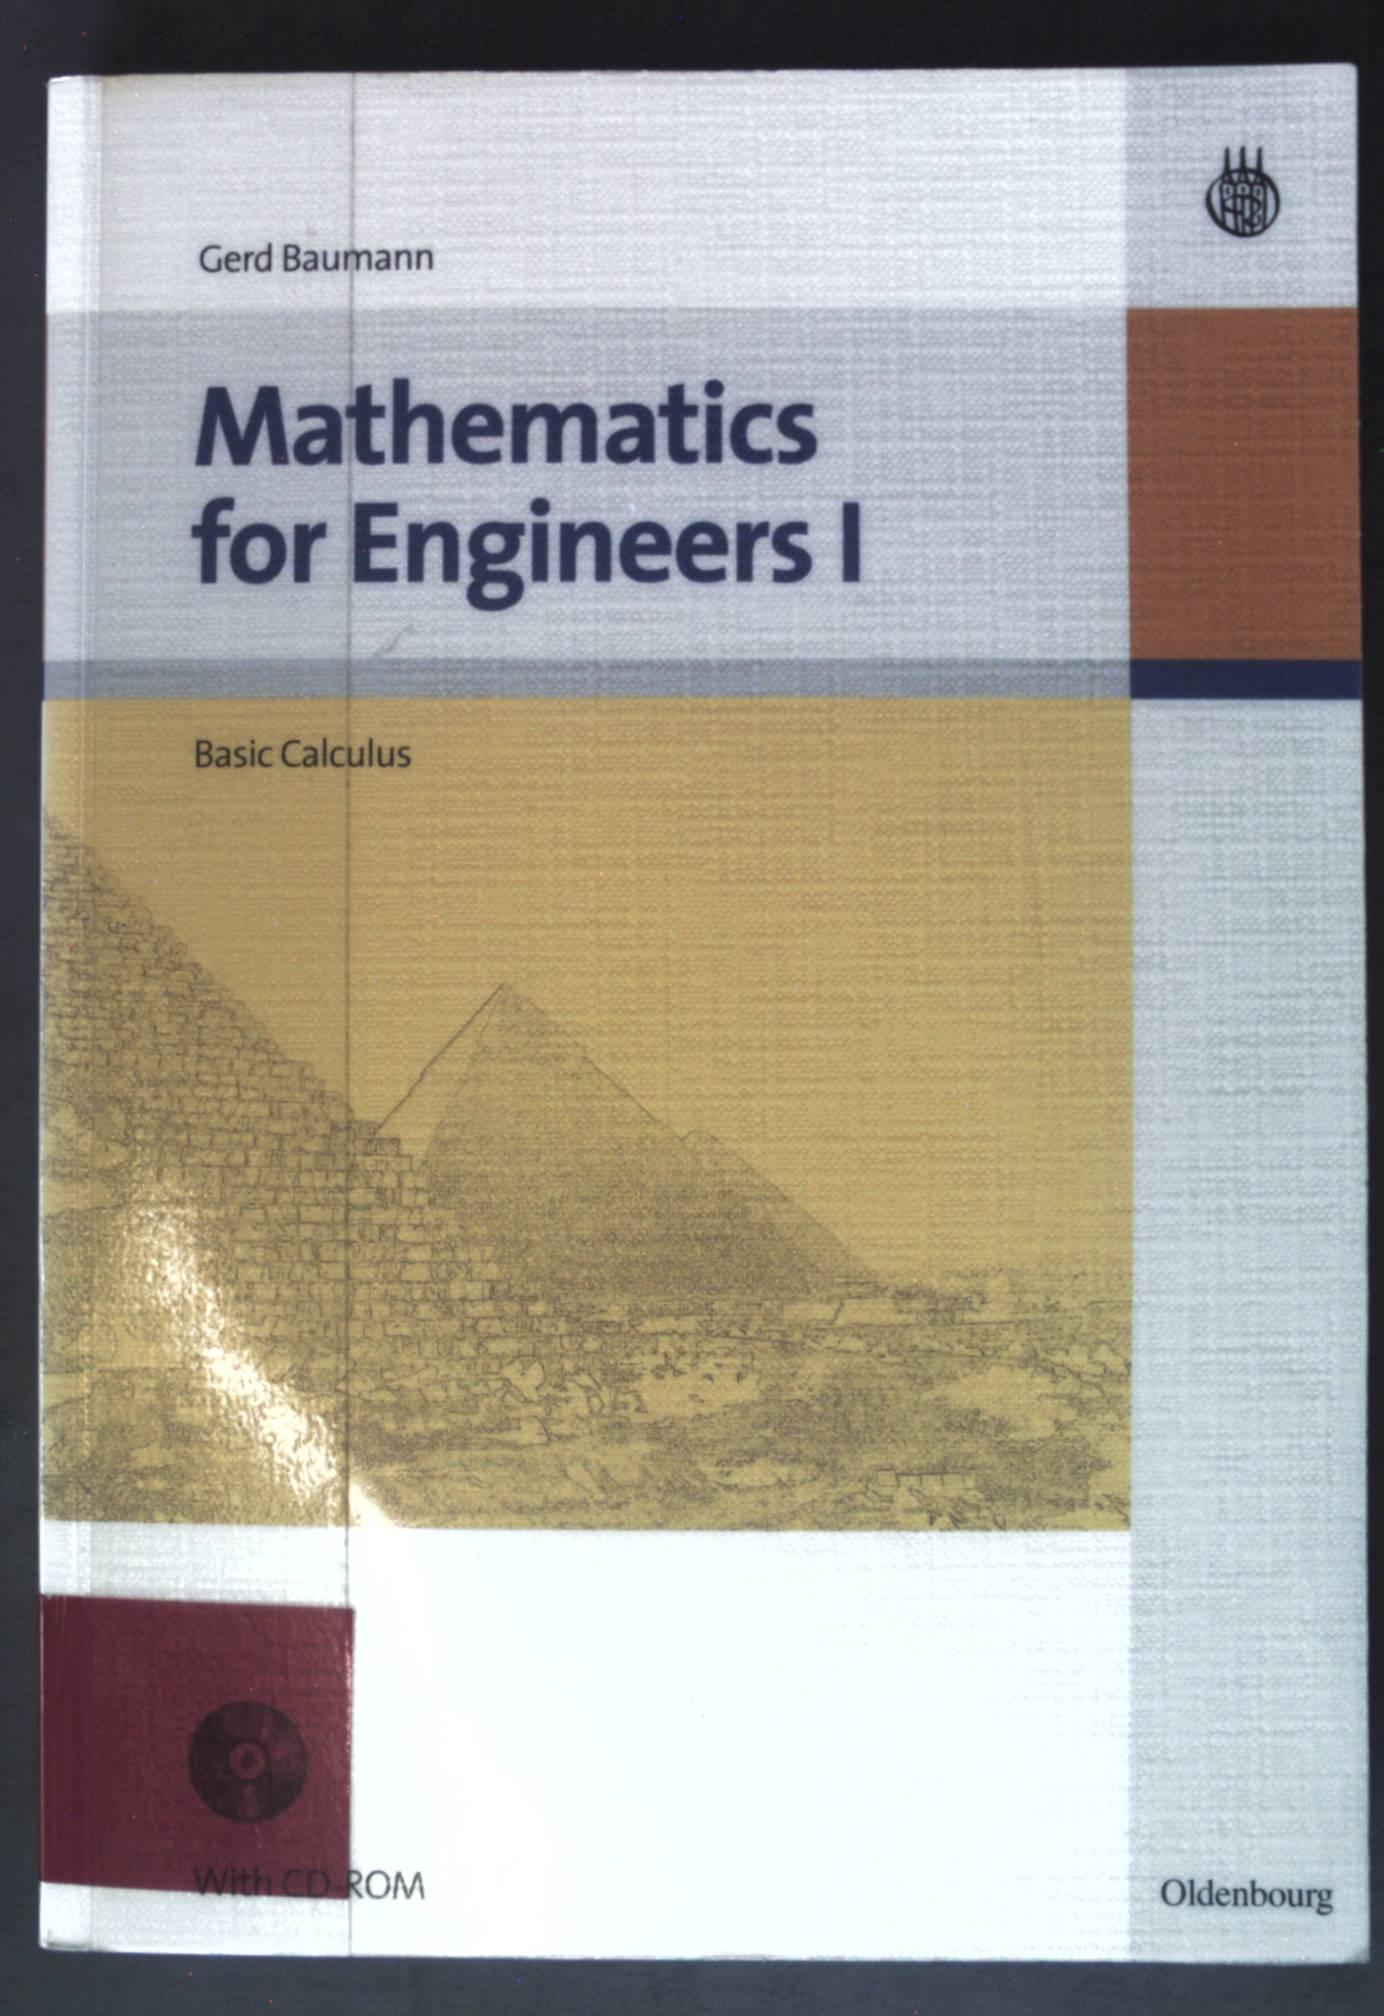 Mathematics for Engineers I: Basic Calculus: Baumann, Gerd: